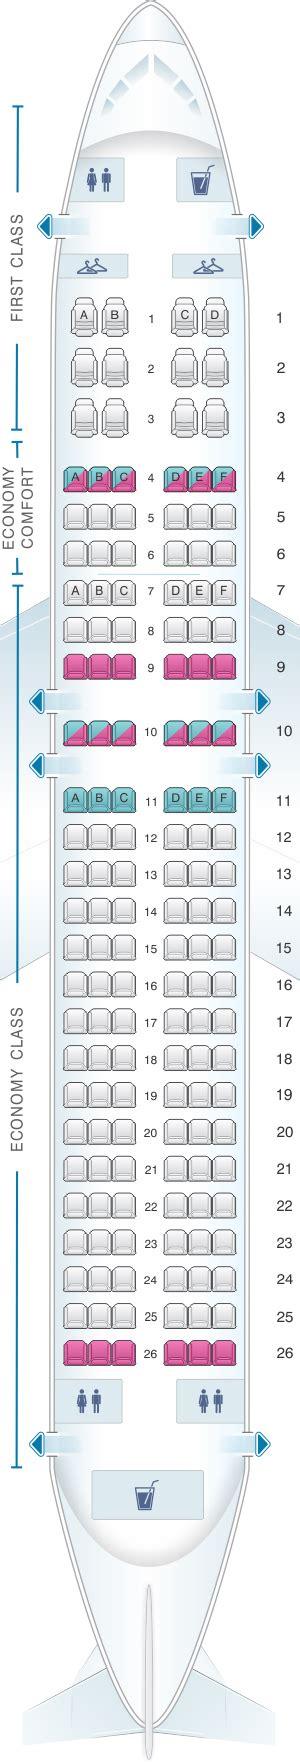 airbus a320 sieges plan de cabine delta air lines airbus a320 200 32r